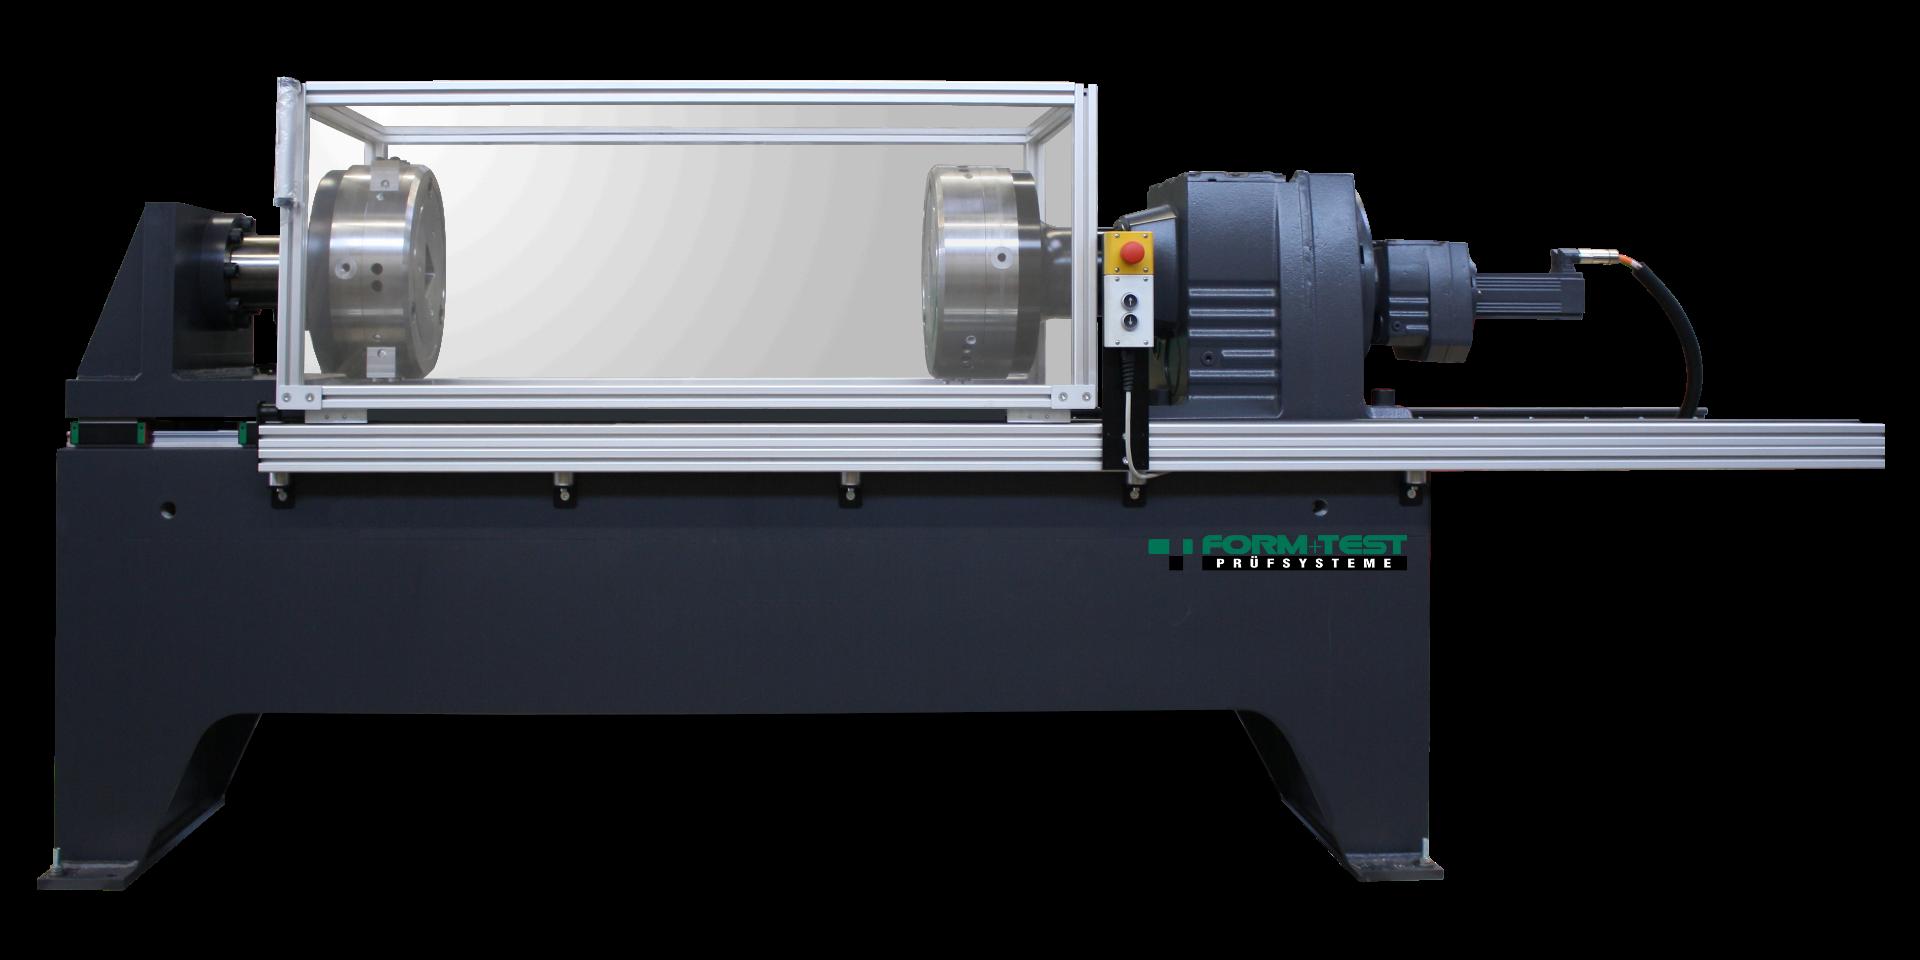 Torsion Testing Machine Up T 5000 Form Test